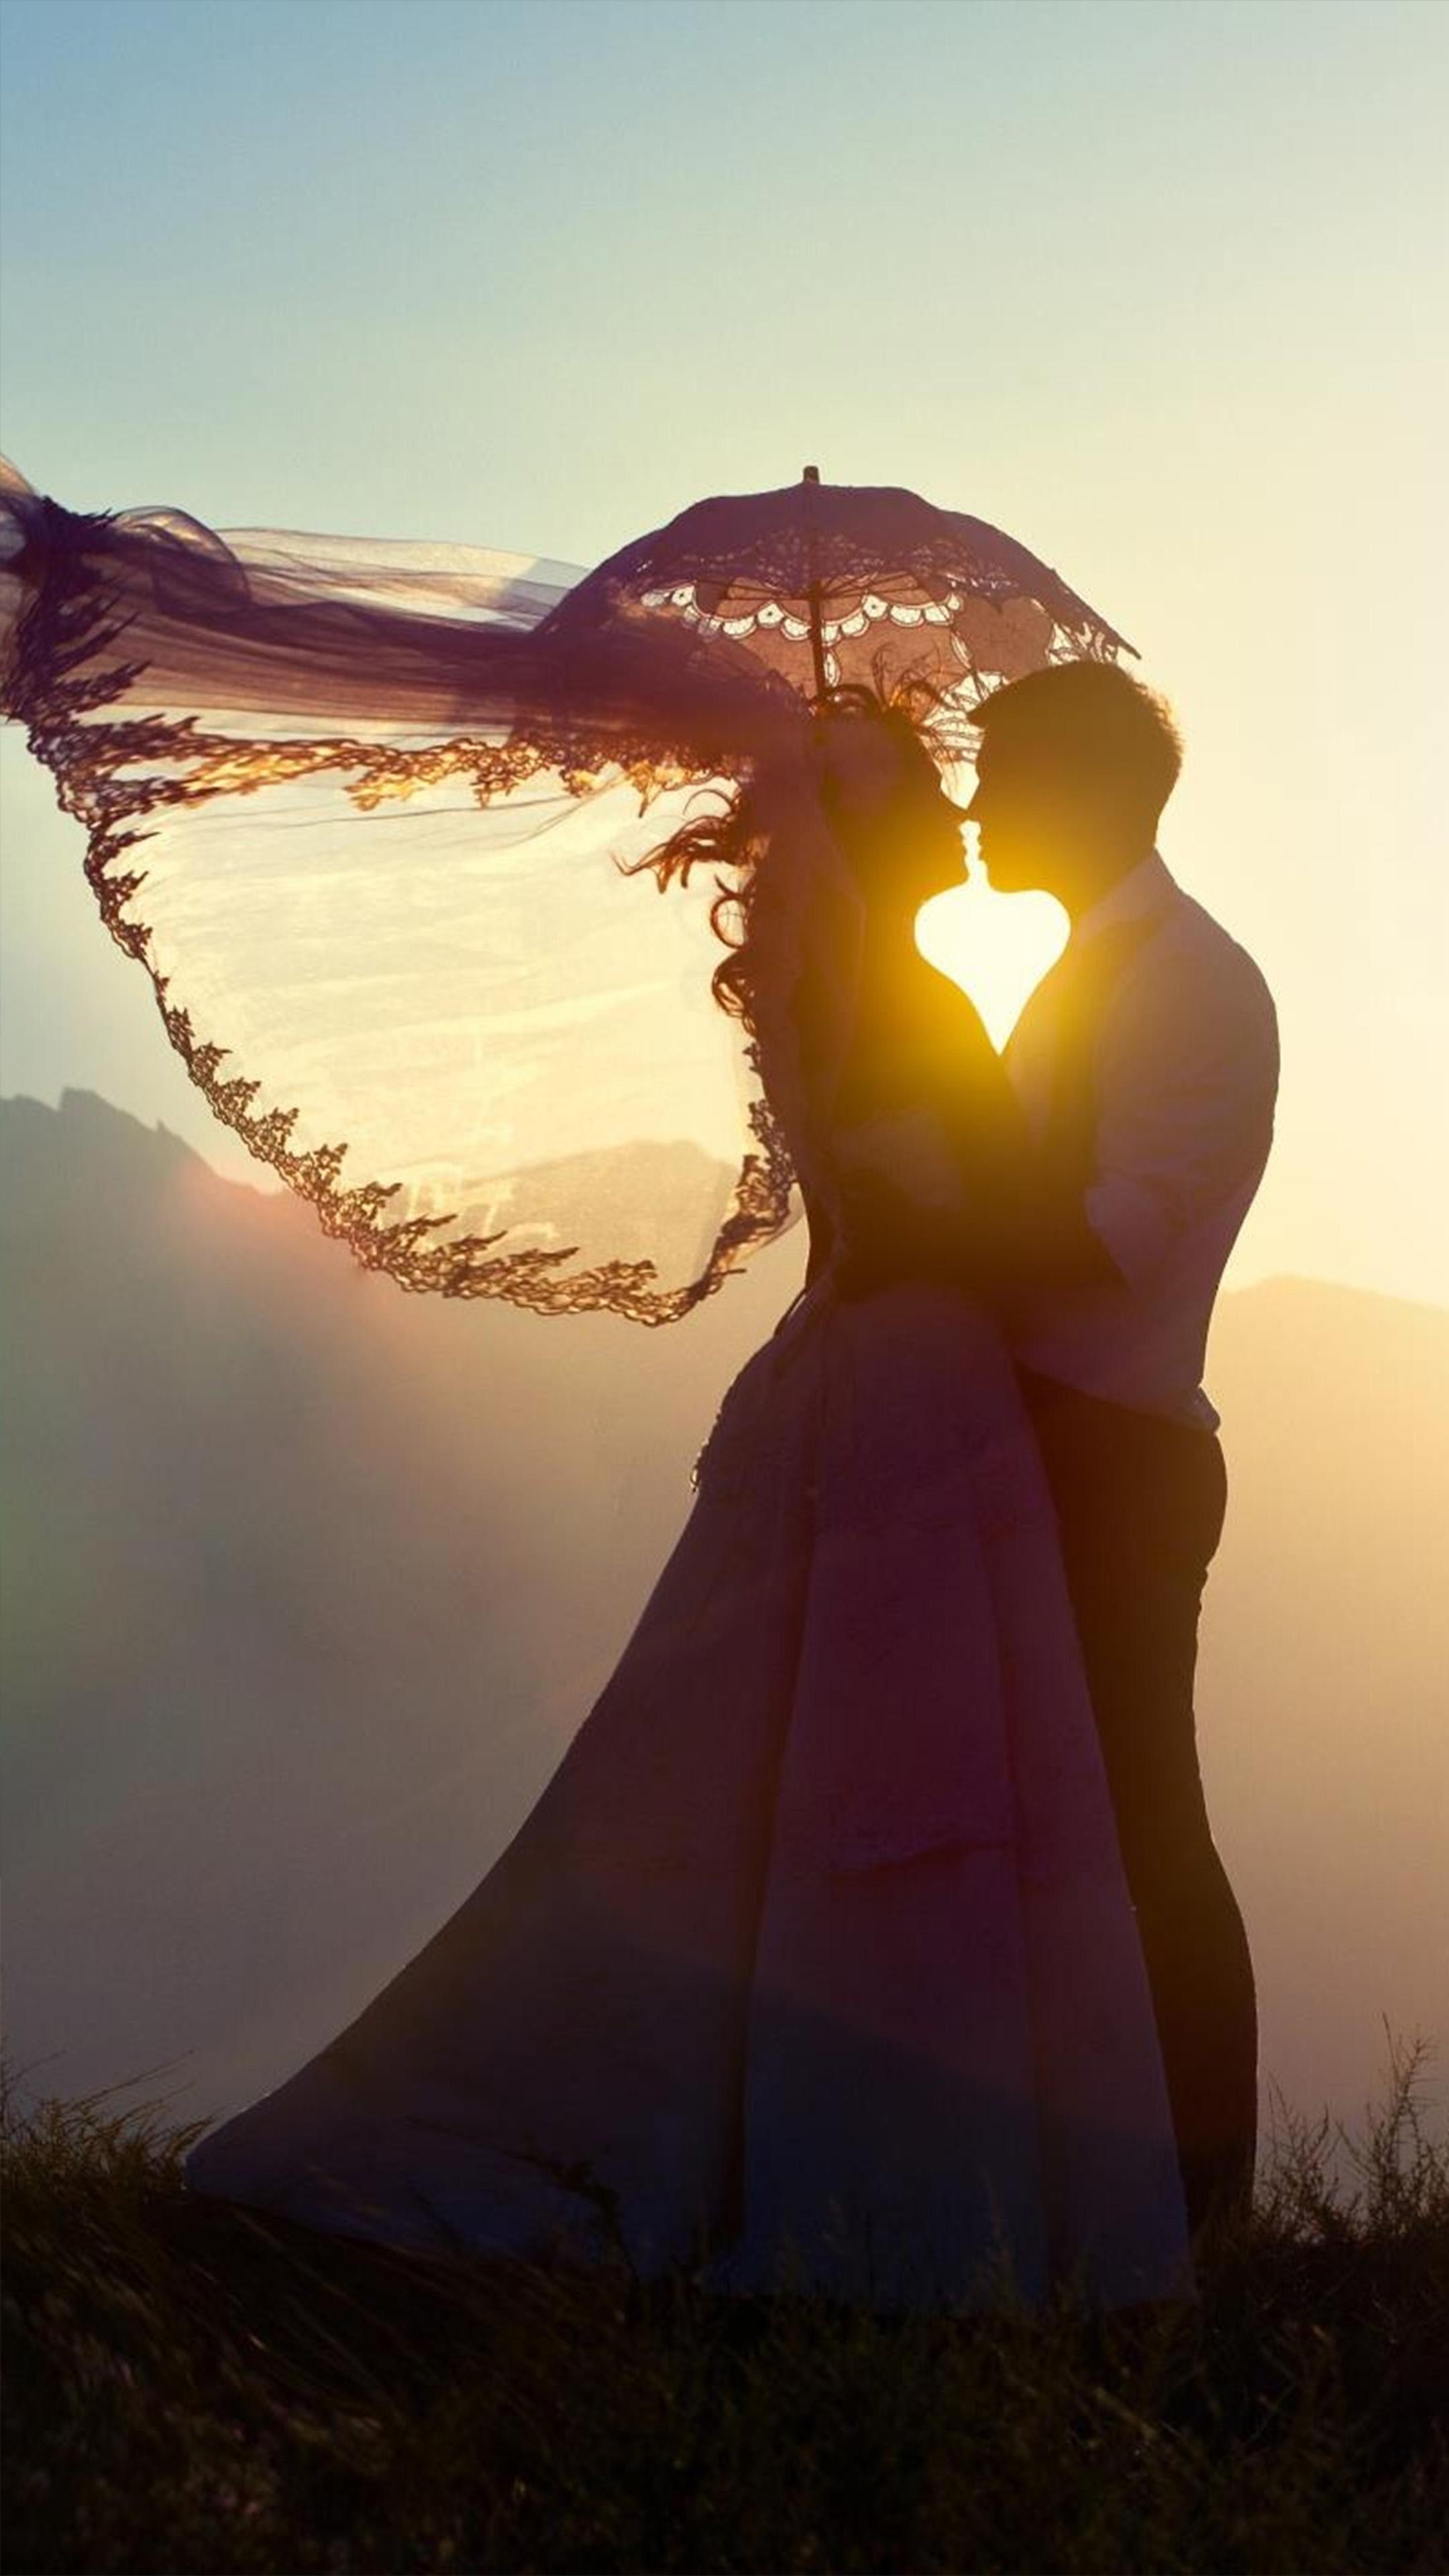 Couple Sunset Heart Free 4K Ultra HD Mobile Wallpaper